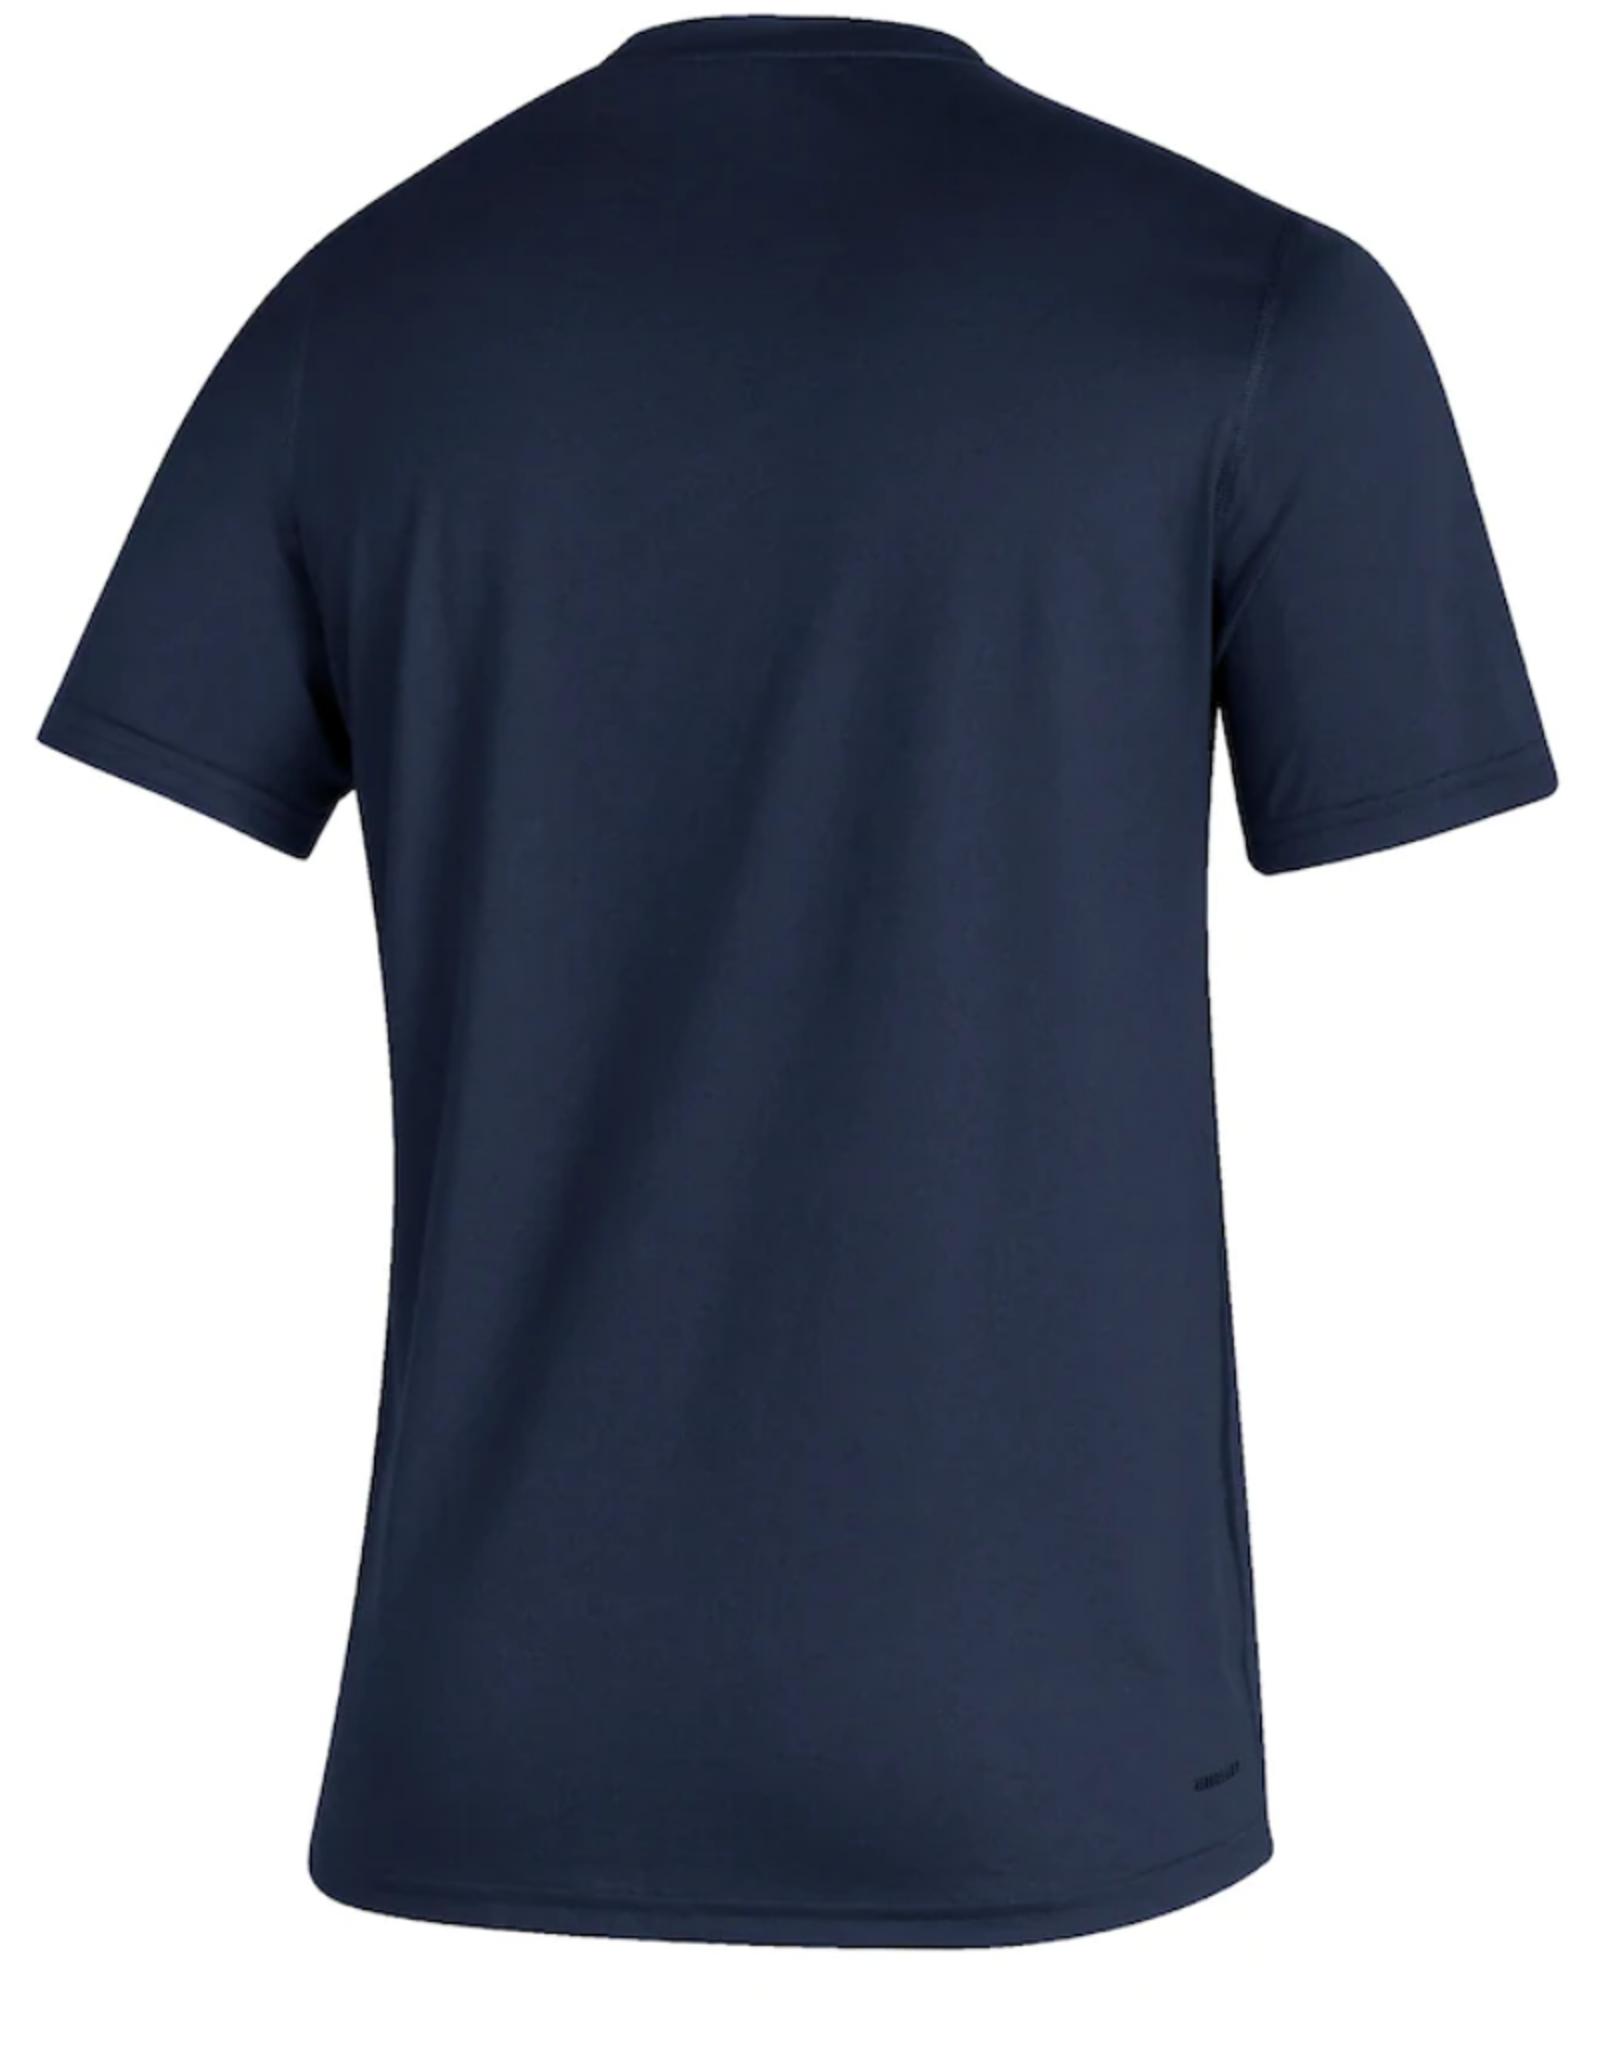 Adidas Adidas Men's Retro Reverse Creator T-Shirt Montreal Canadiens Navy